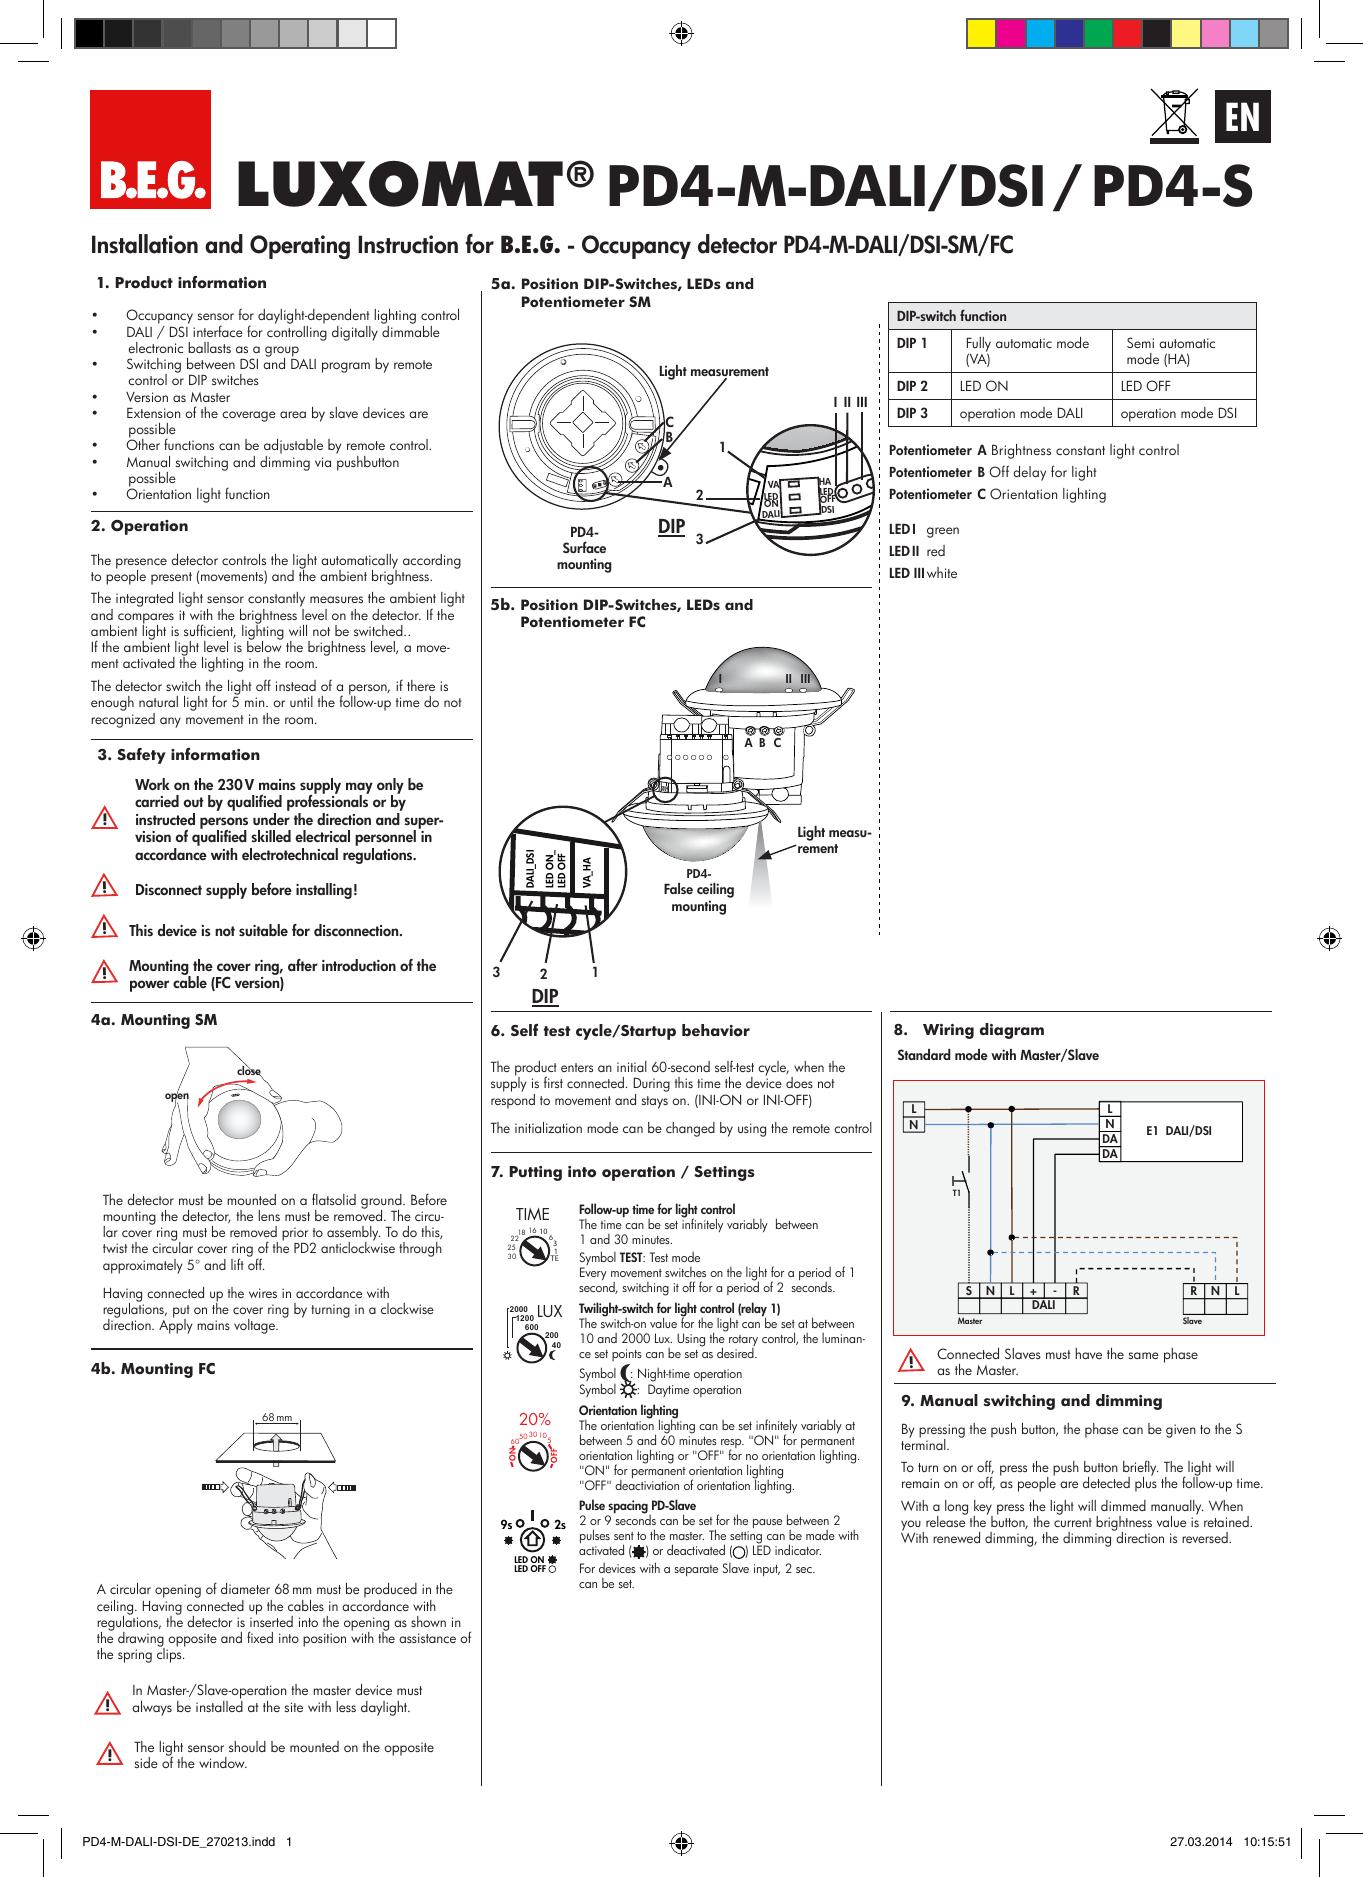 LUXOMAT® PD4-M-DALI/DSI / PD4-S on